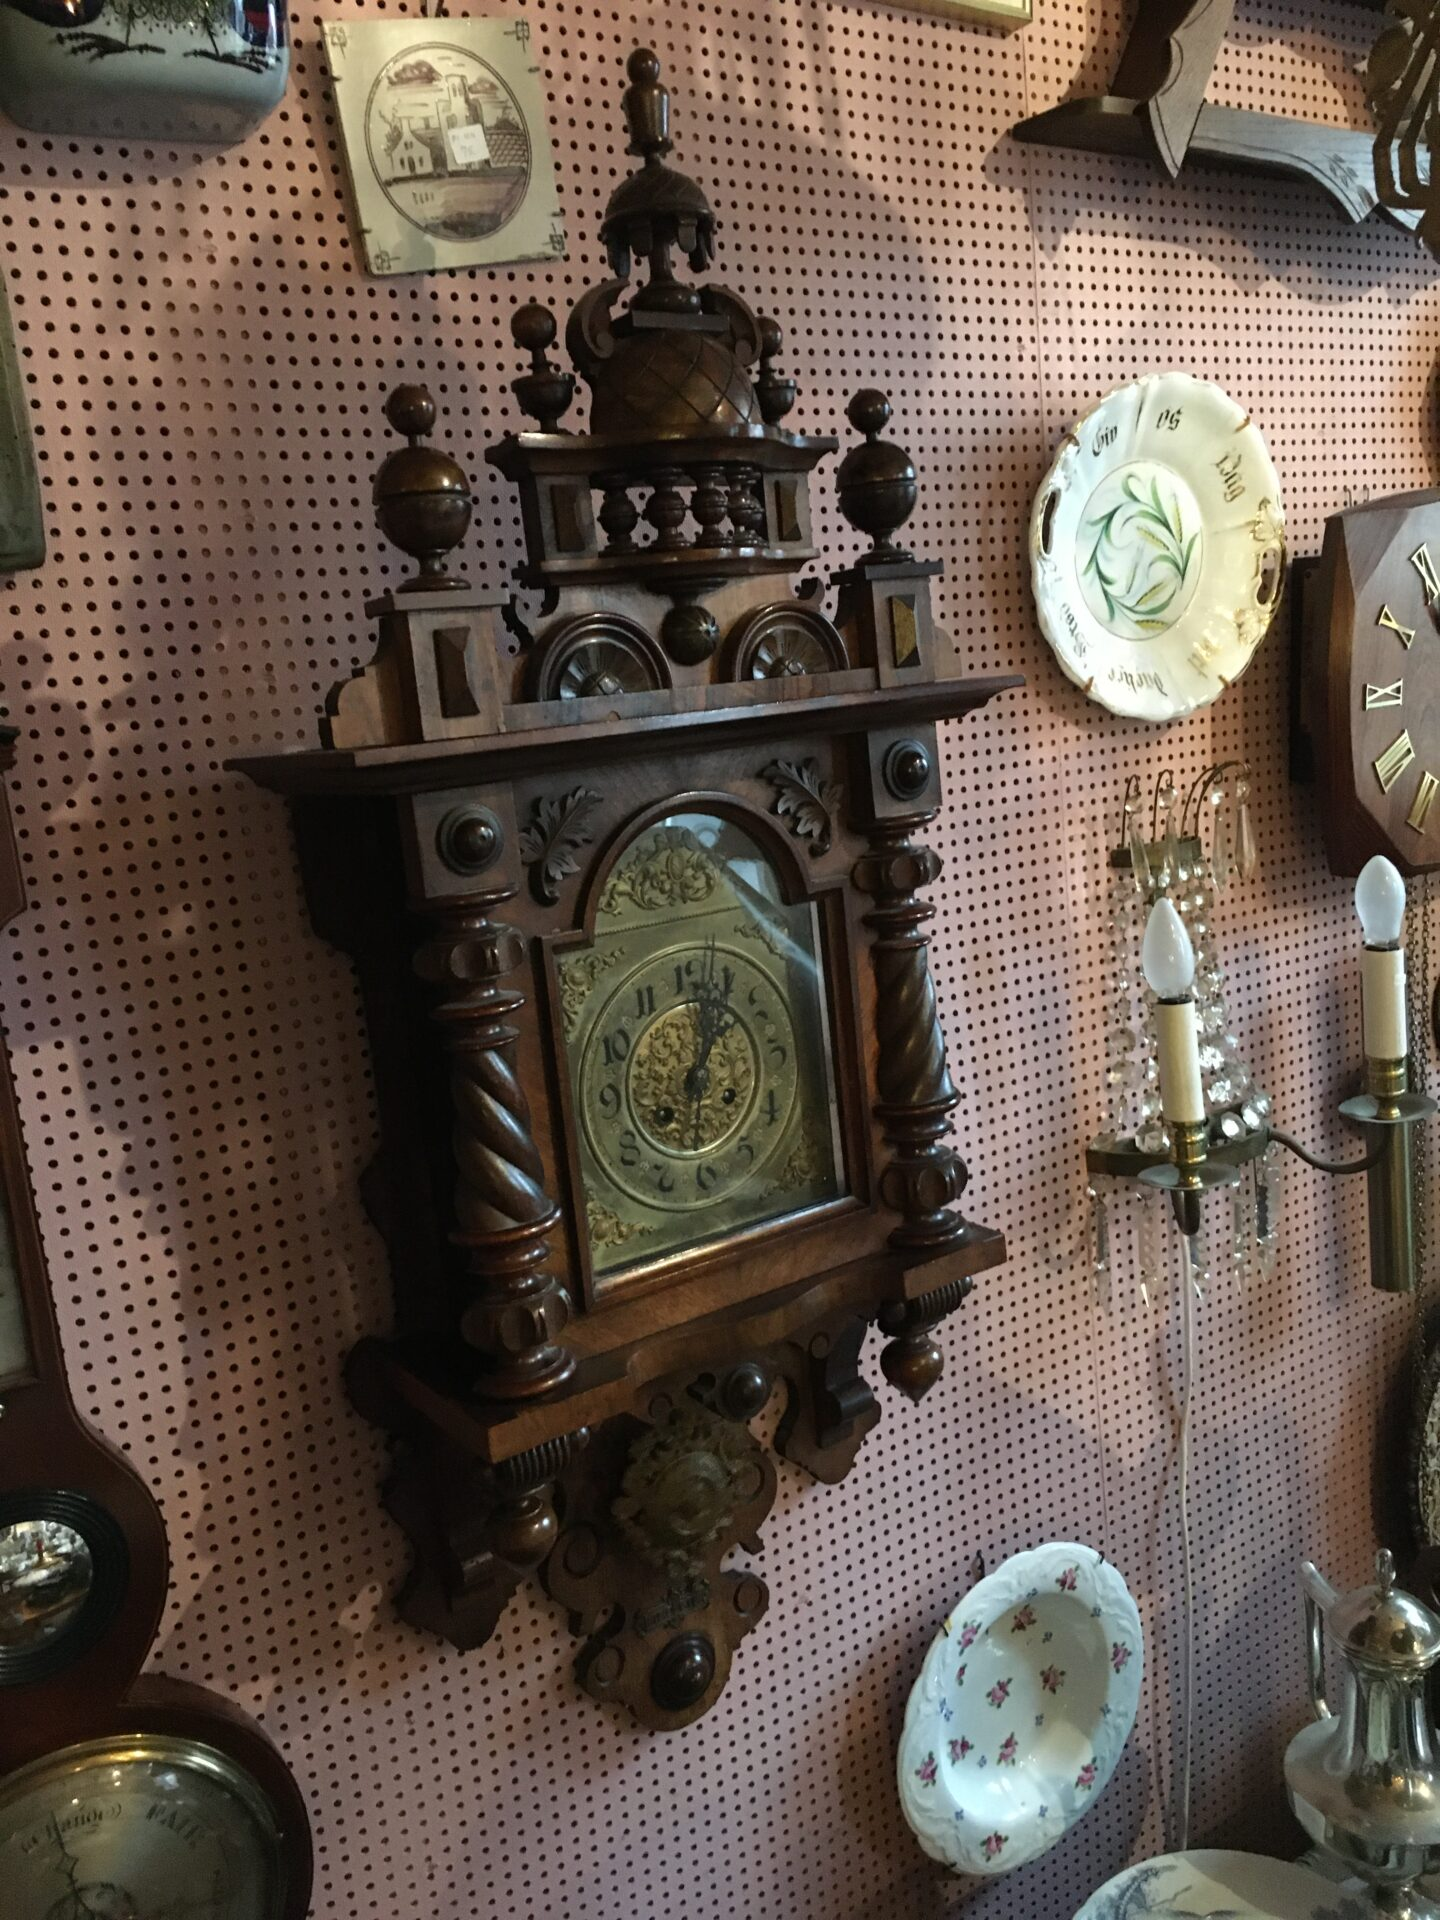 Antikt vægur i mahognikasse (går og slår), pris 1200kr